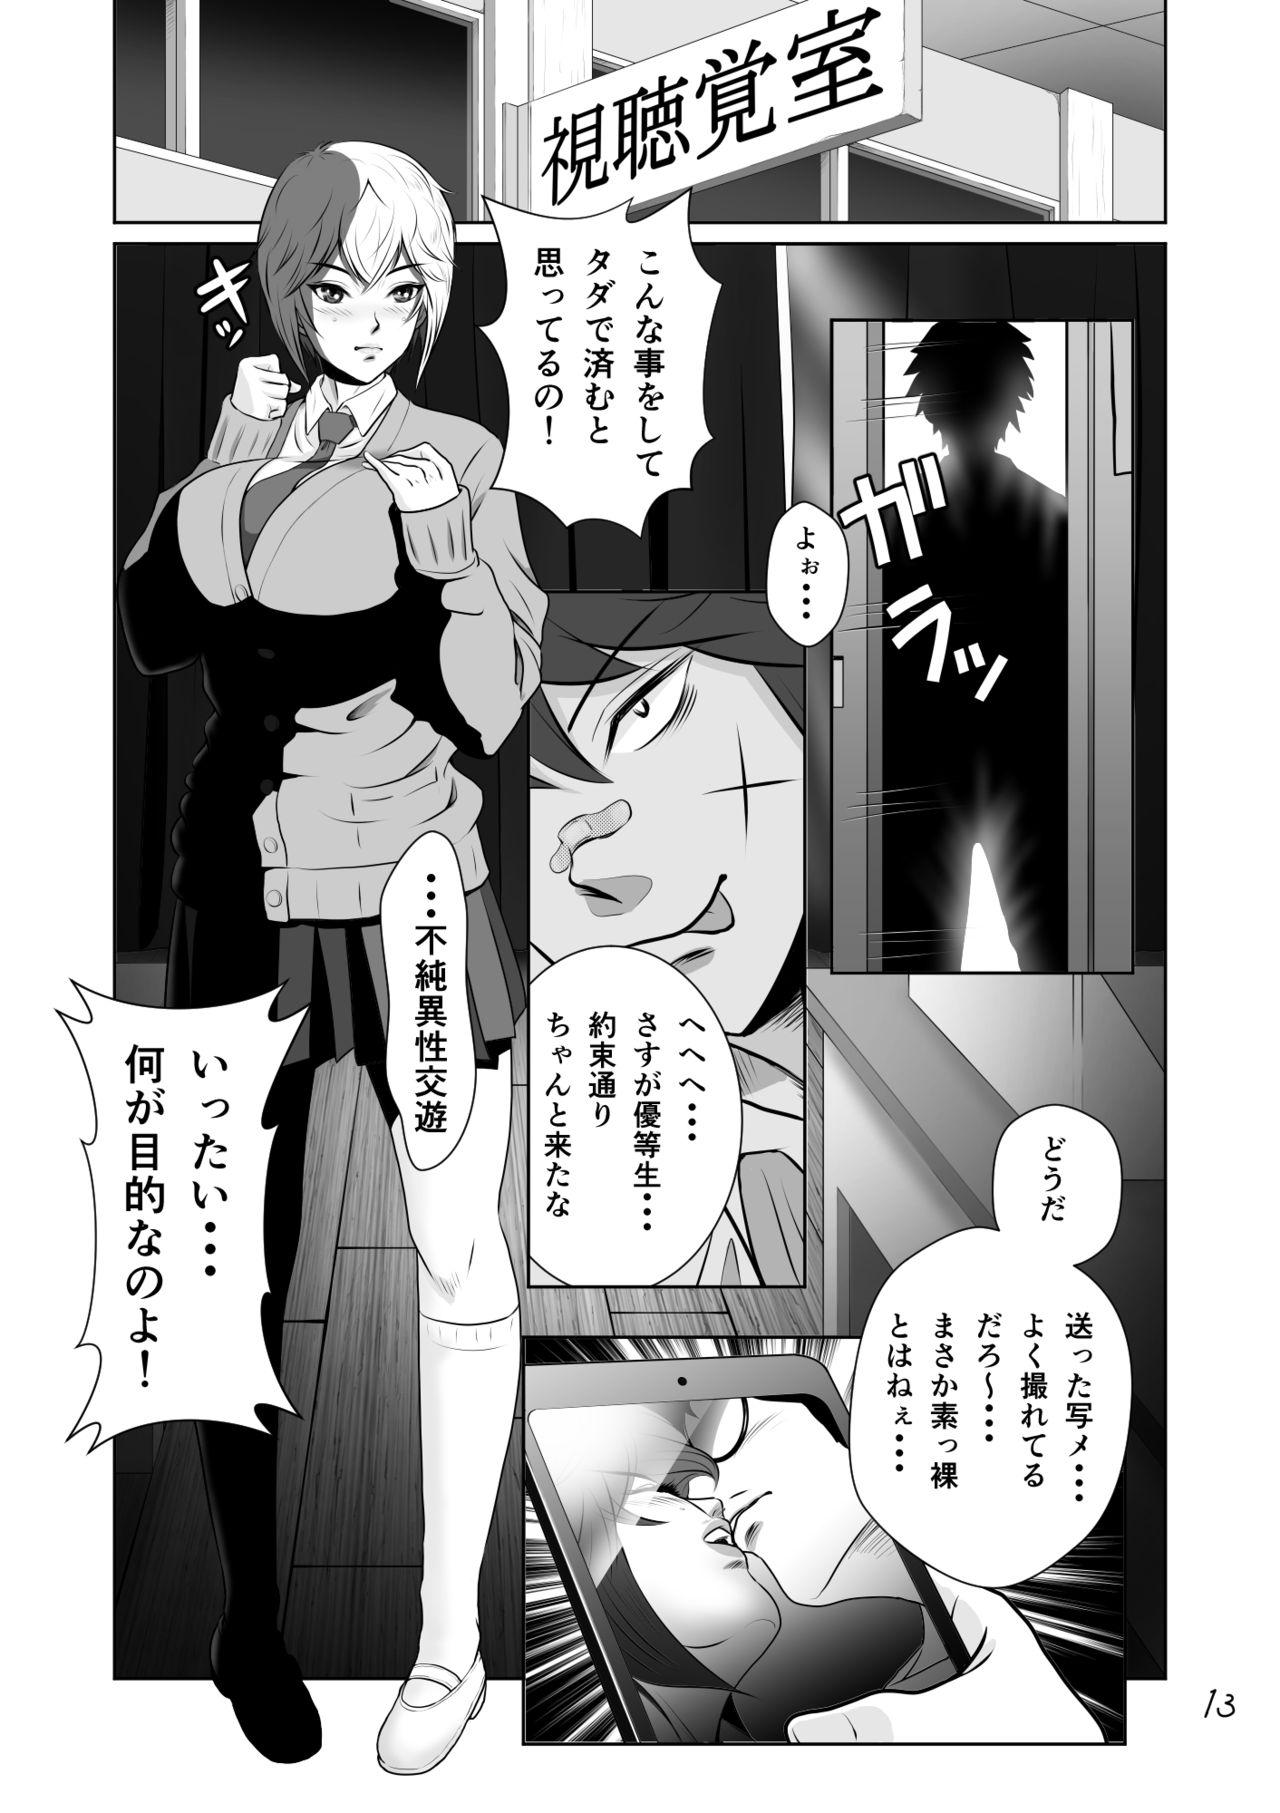 Netorare Osananajimi Haruka-chan Kiki Ippatsu!! 13